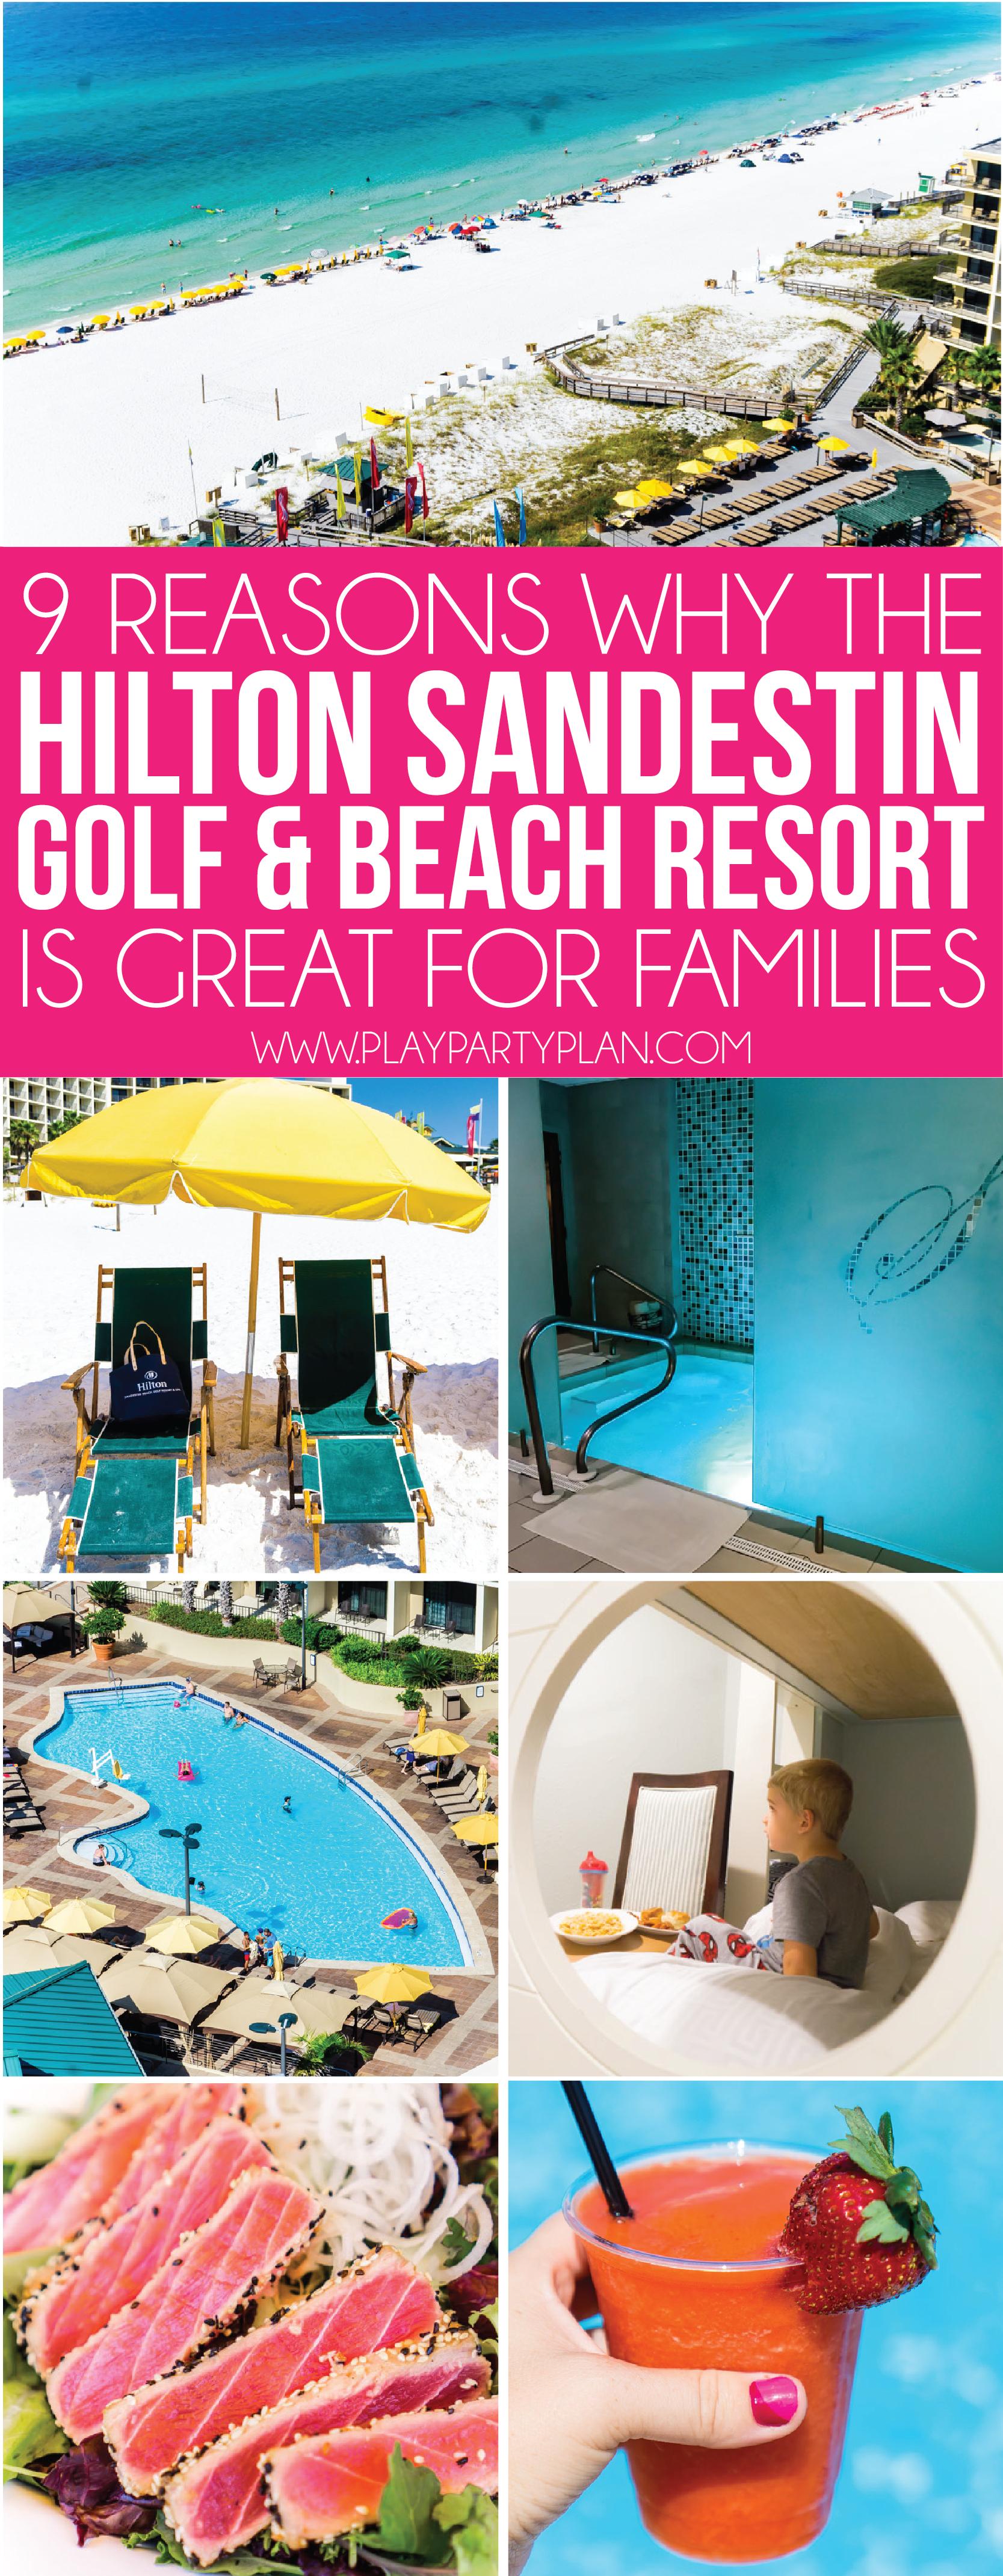 9 Reasons Families Will Love The Hilton Sandestin Beach Sandestin Golf And Beach Resort Beach Resort Design Family Beach Resorts